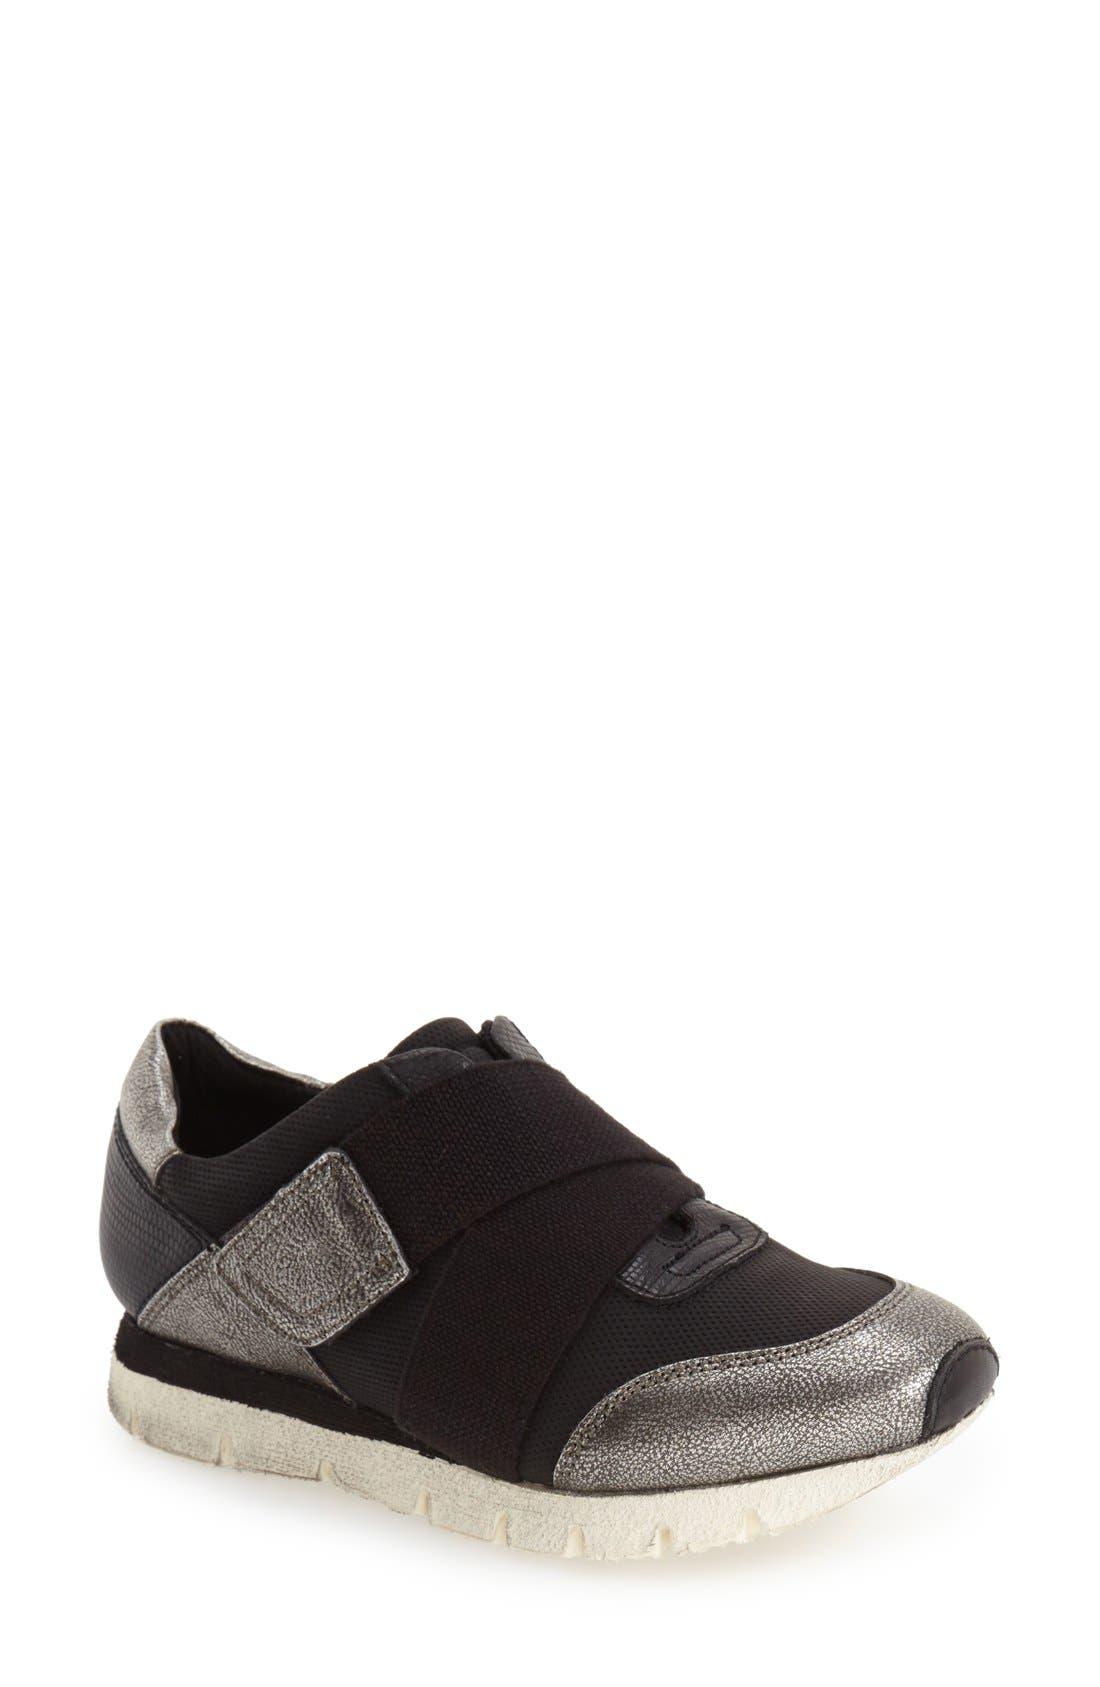 Alternate Image 1 Selected - OTBT 'New Wave' Sneaker (Women)